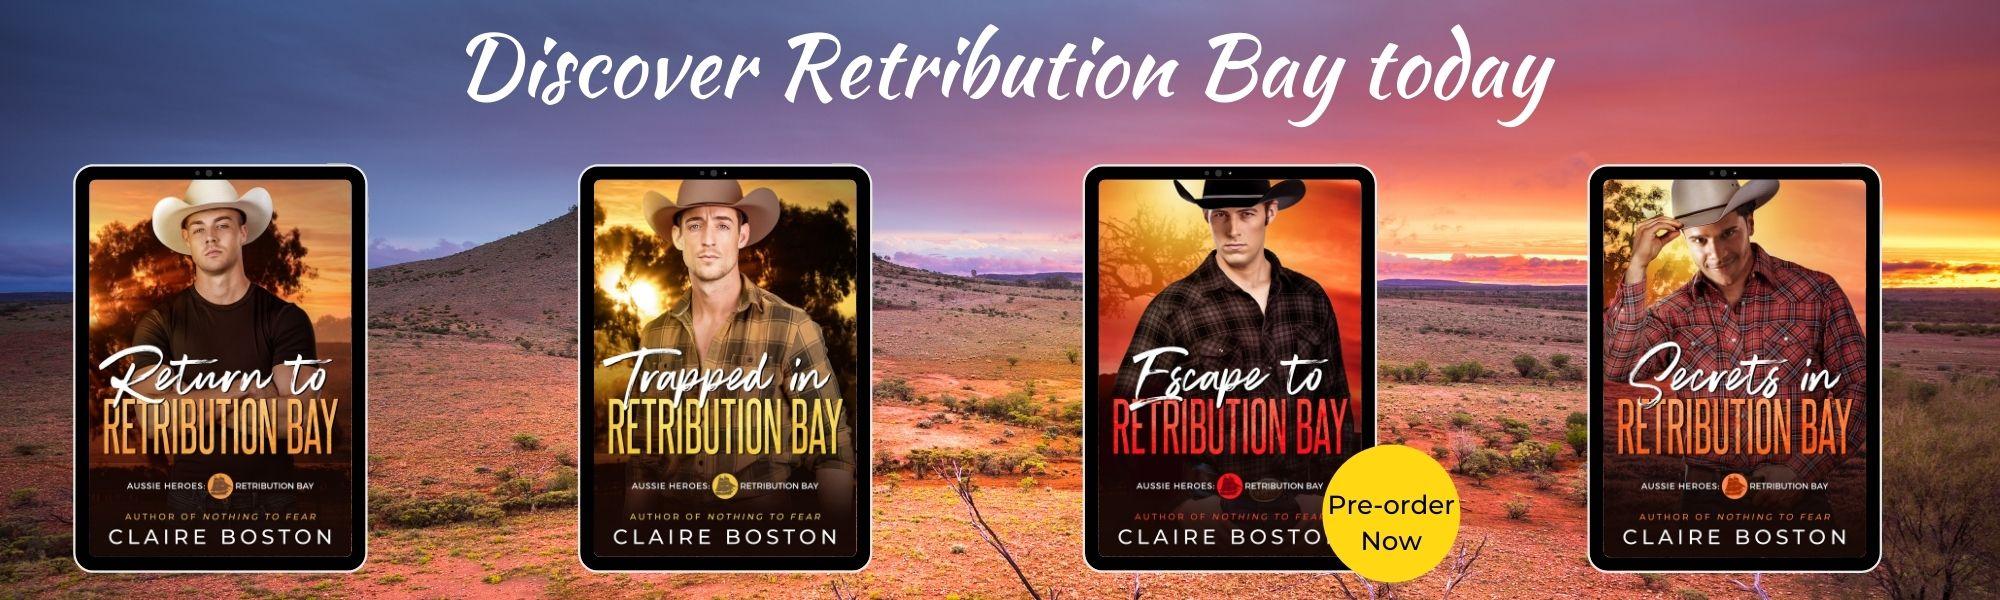 Books 1-4 of Aussie Heroes: Retribution Bay